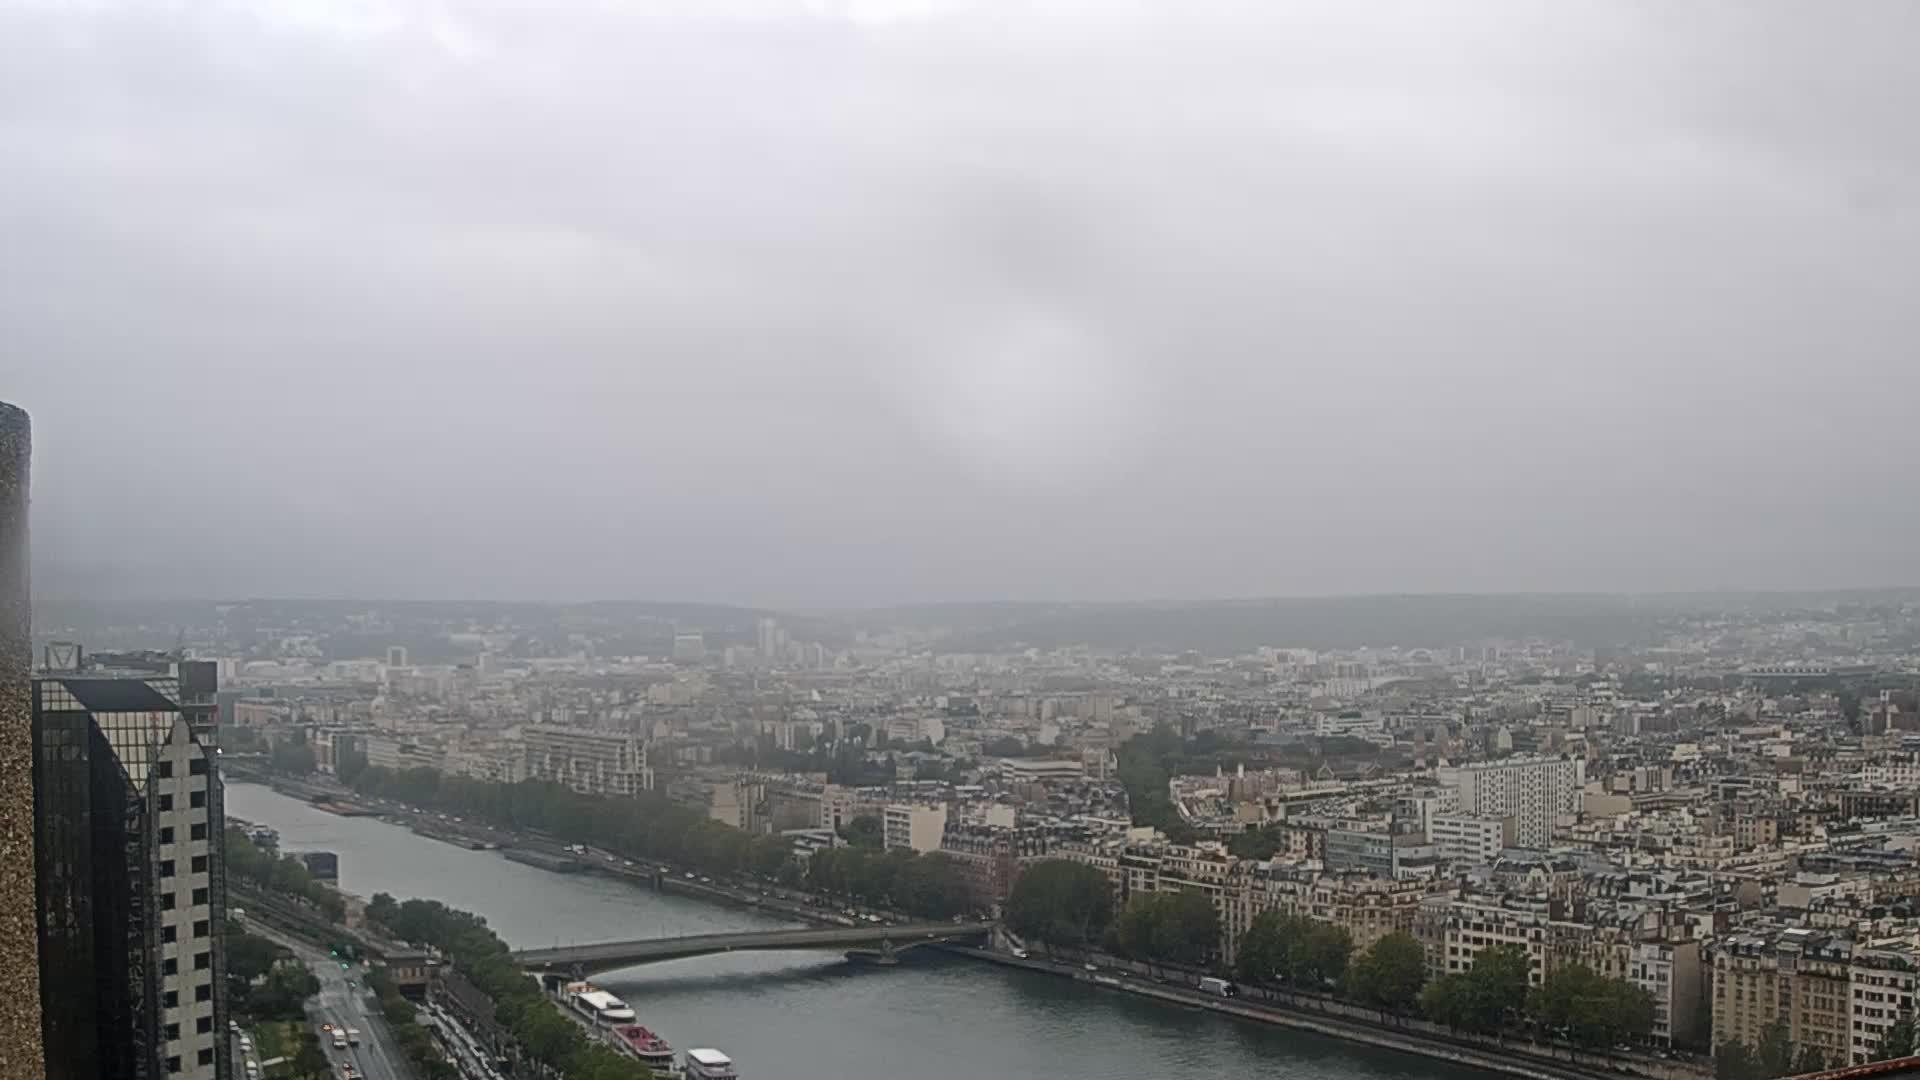 Parigi Gio. 07:24